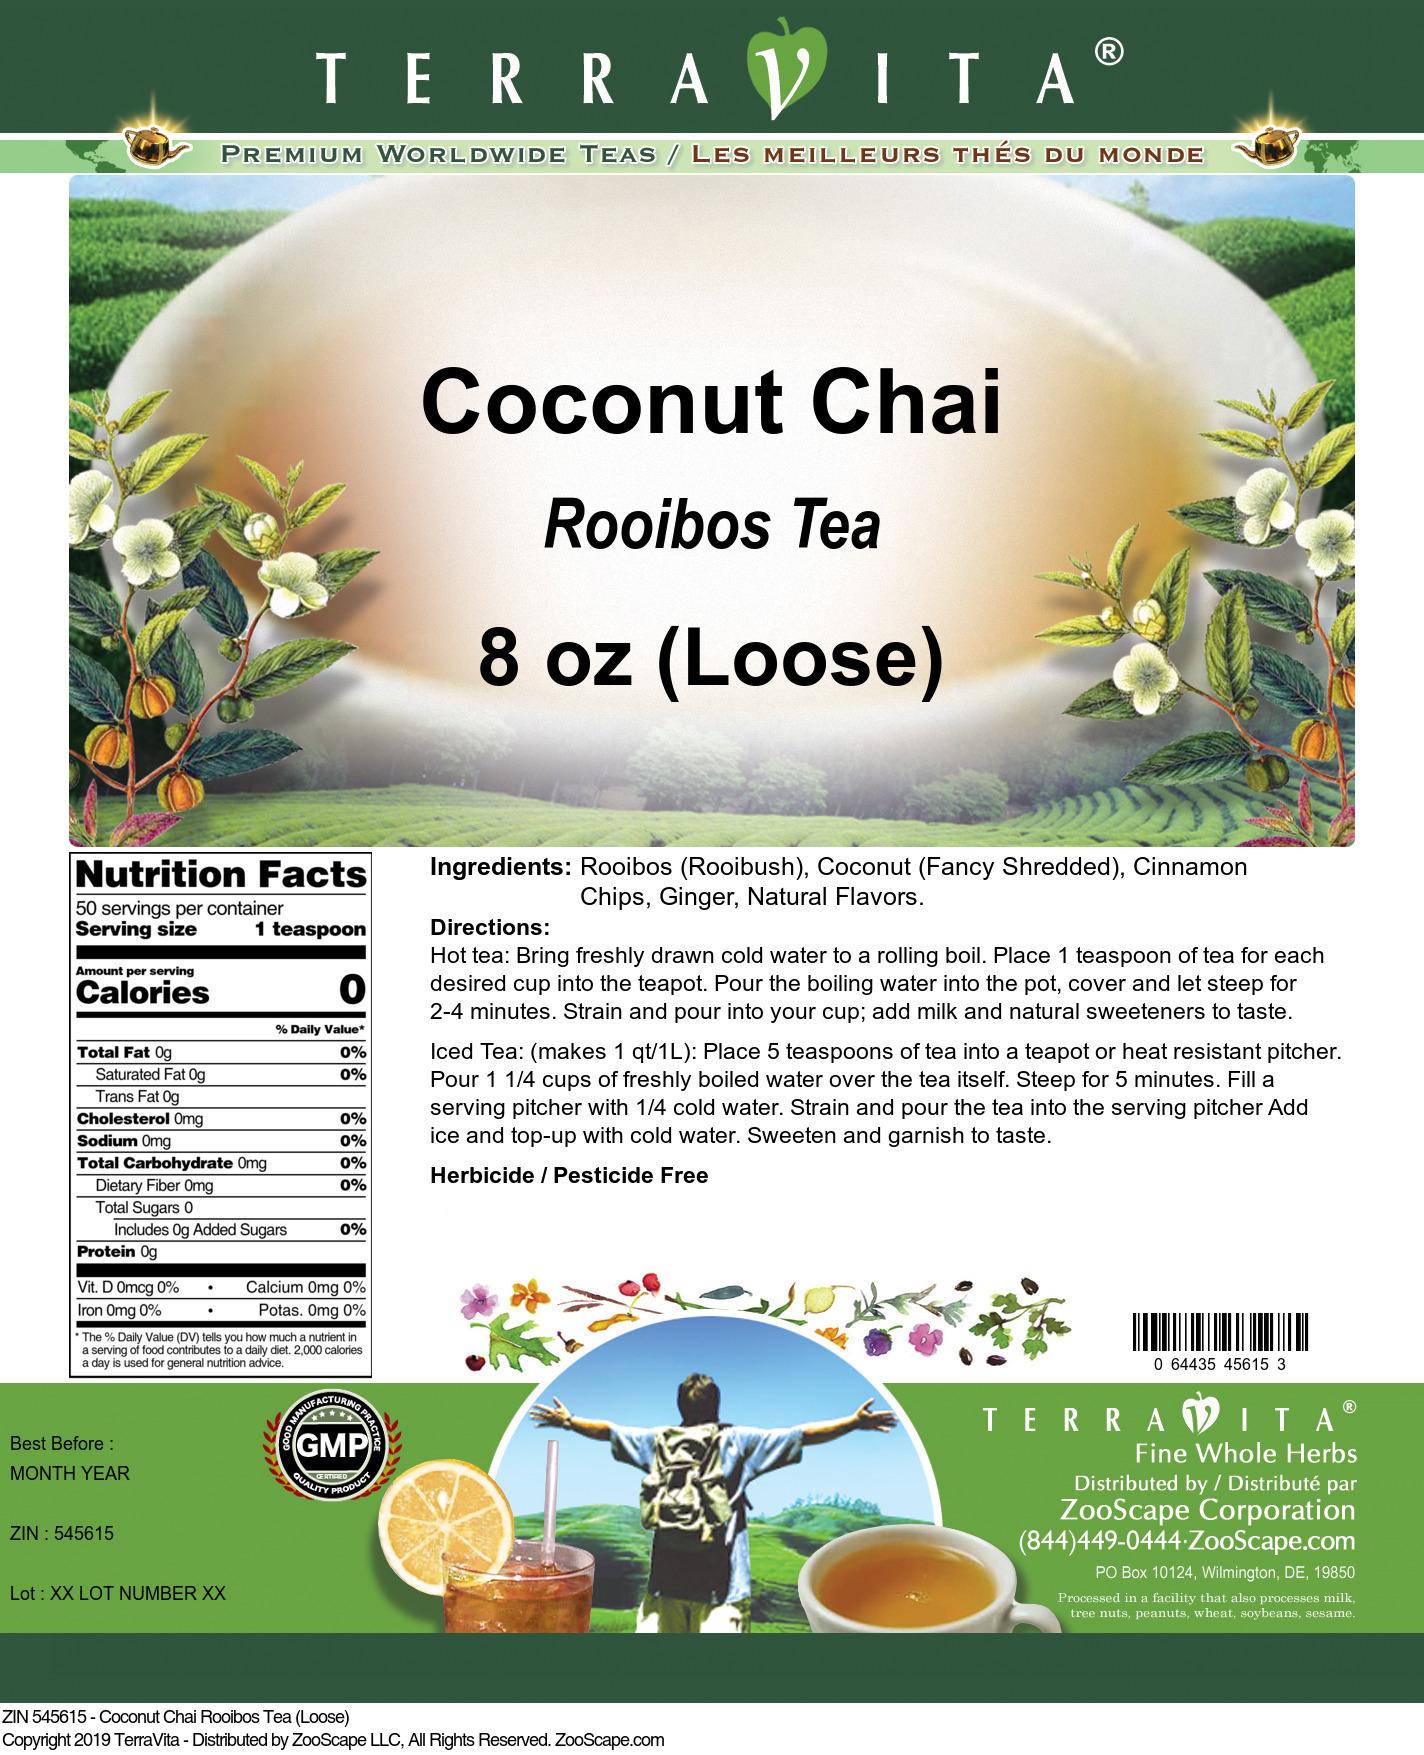 Coconut Chai Rooibos Tea (Loose)